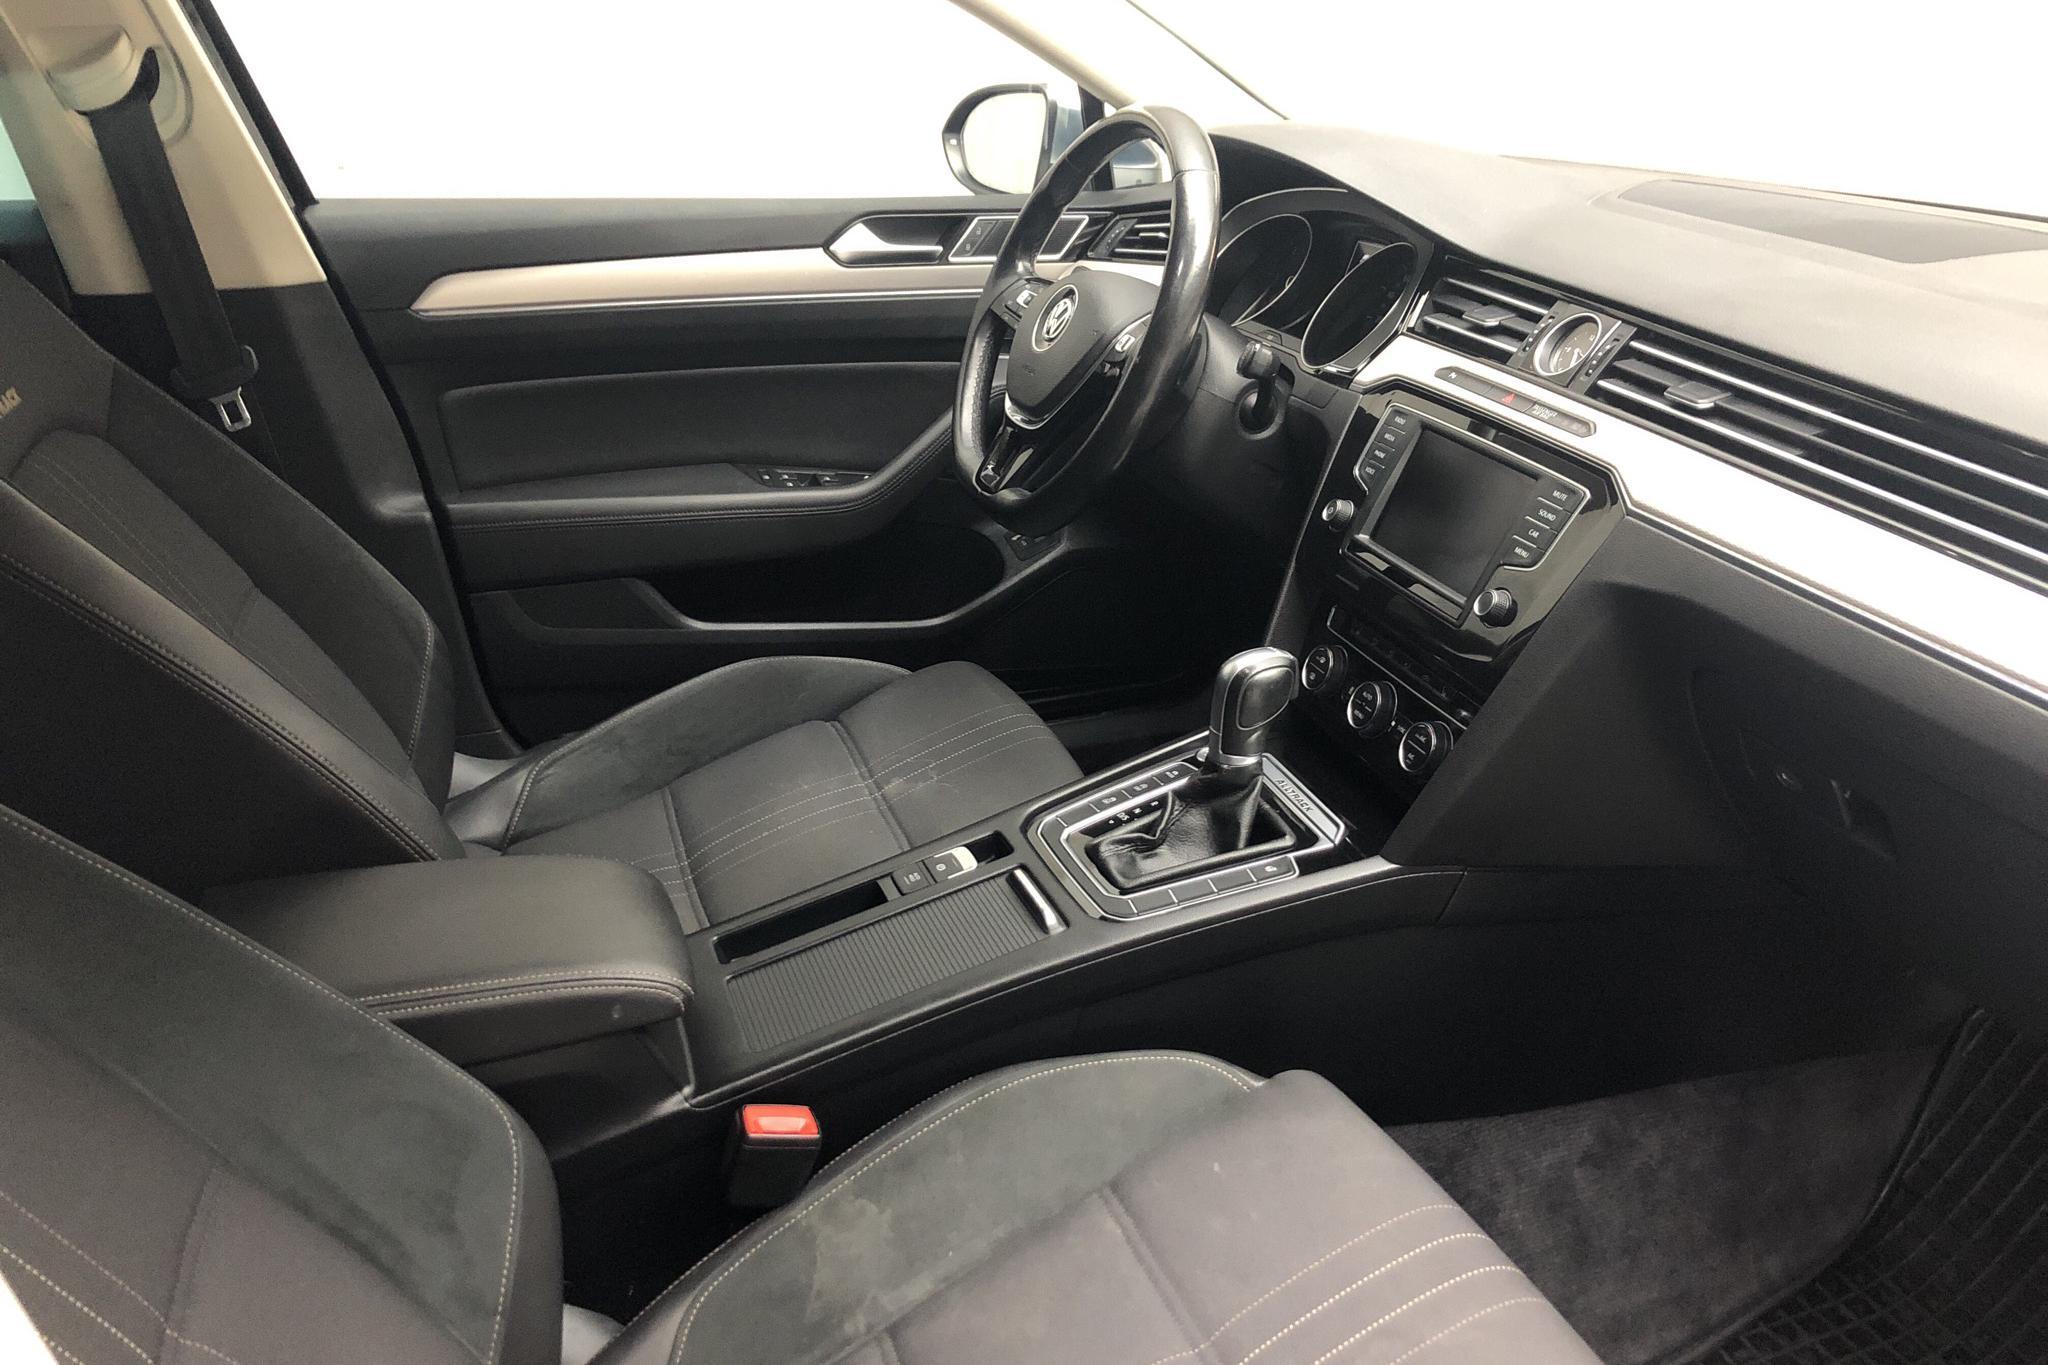 VW Passat Alltrack 2.0 TDI Sportscombi 4MOTION (190hk) - 19 063 mil - Automat - svart - 2017